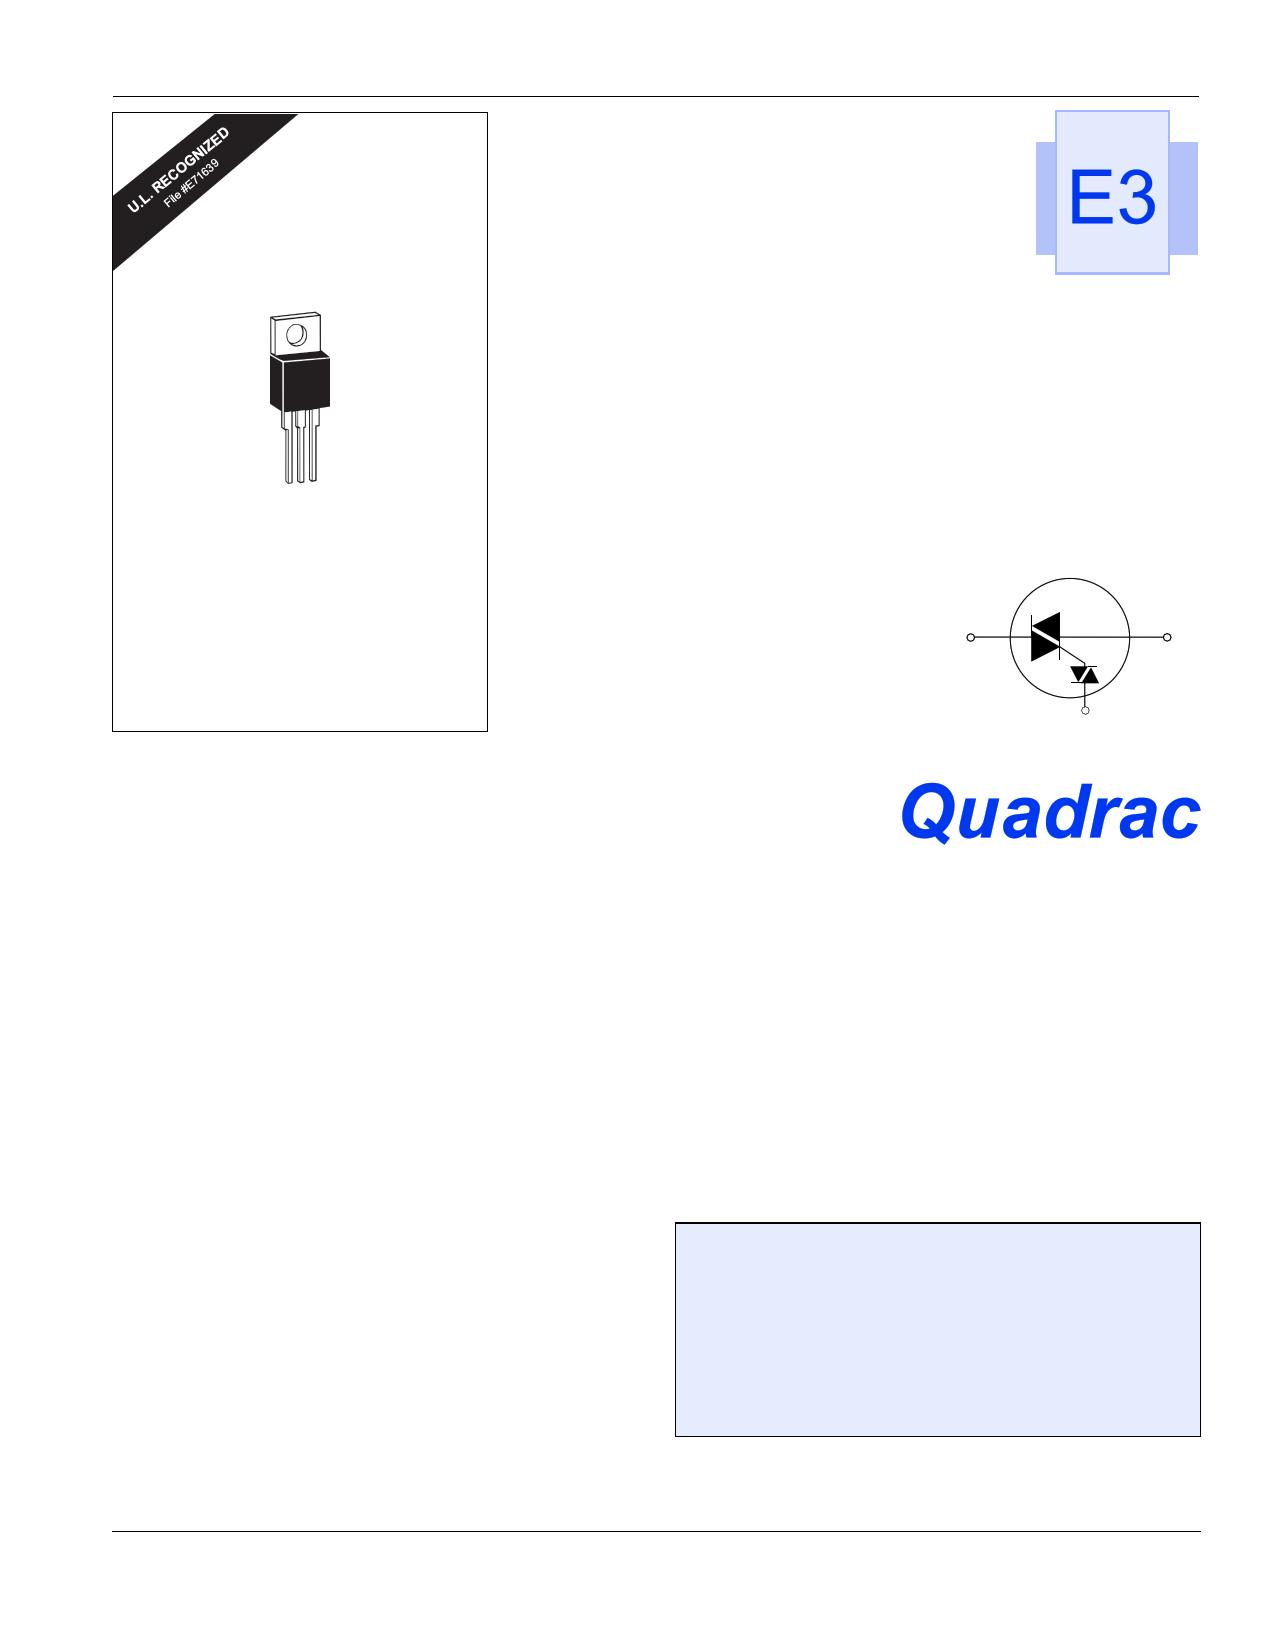 Q2008LT دیتاشیت PDF